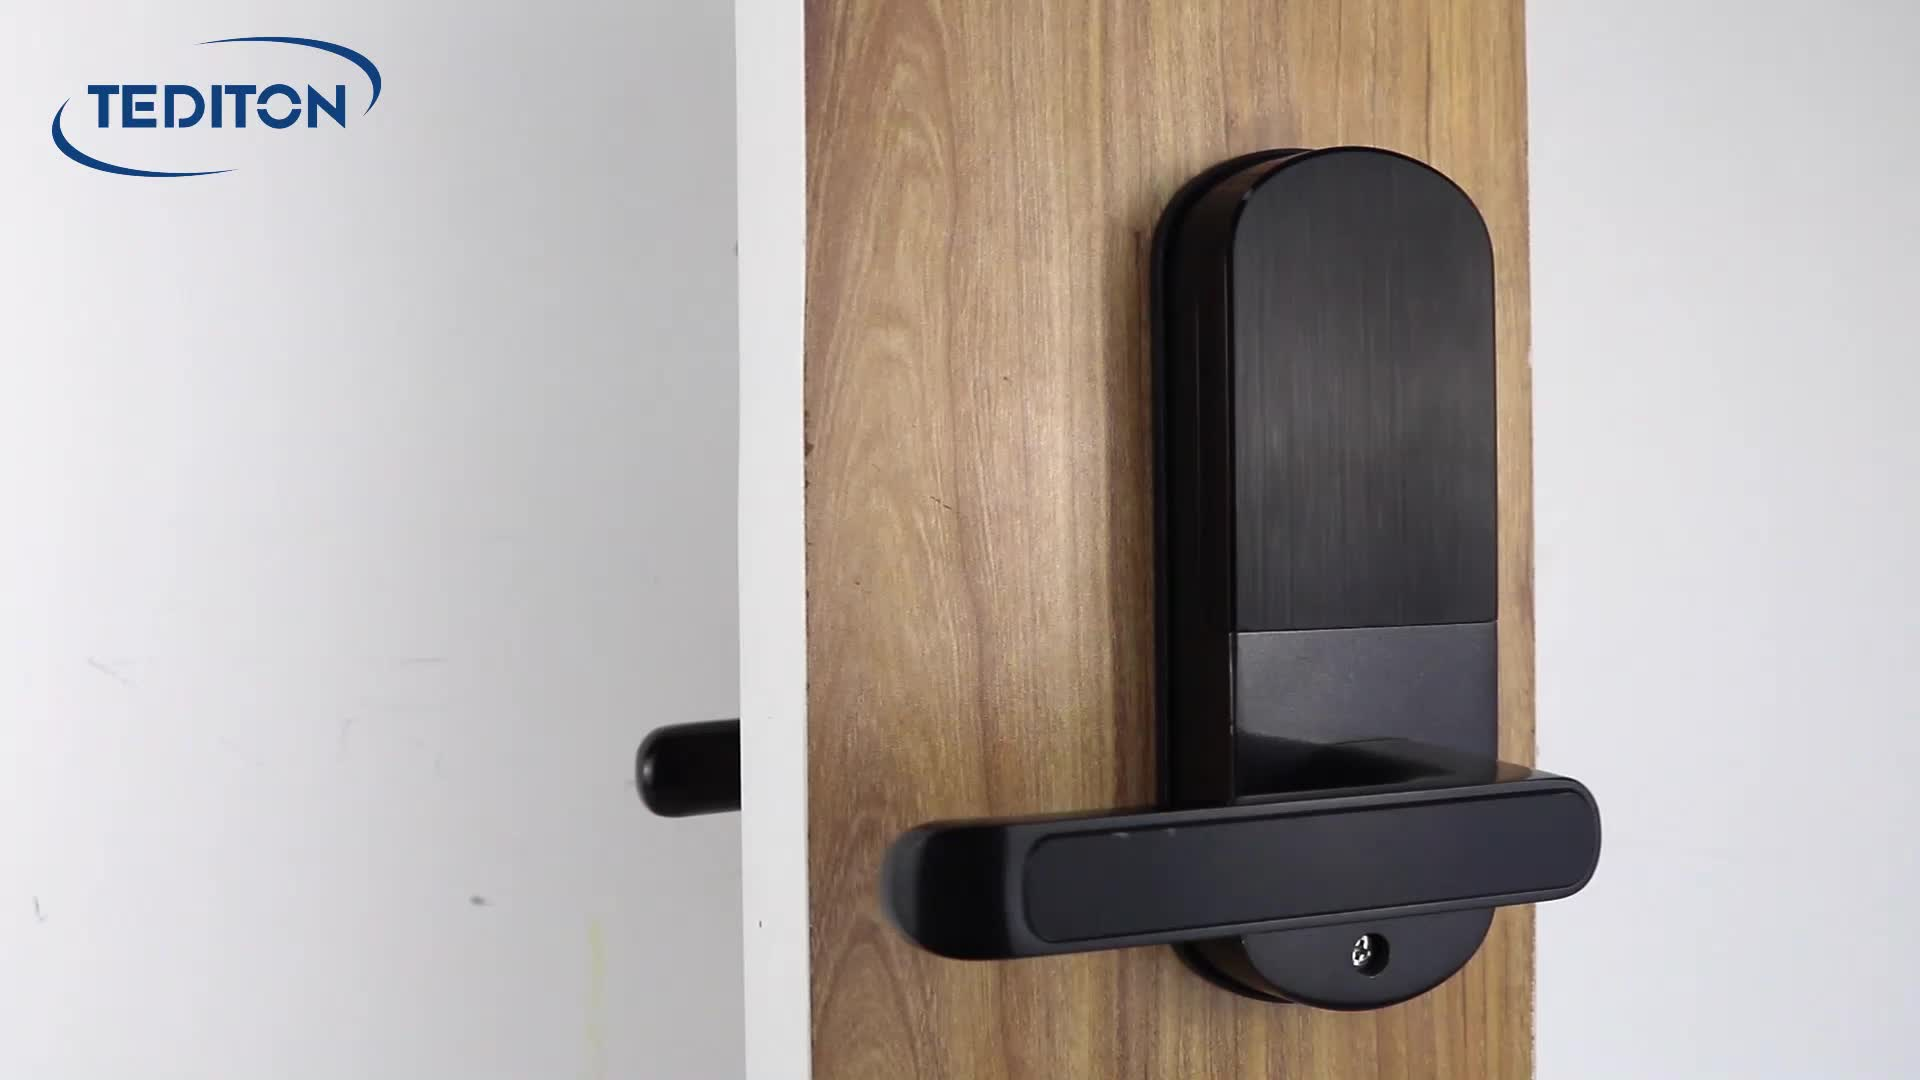 Tuya Smart Home Alexa Keamanan Wifi Sidik Jari Biometrik Kunci Pintu dengan Bel Pintu